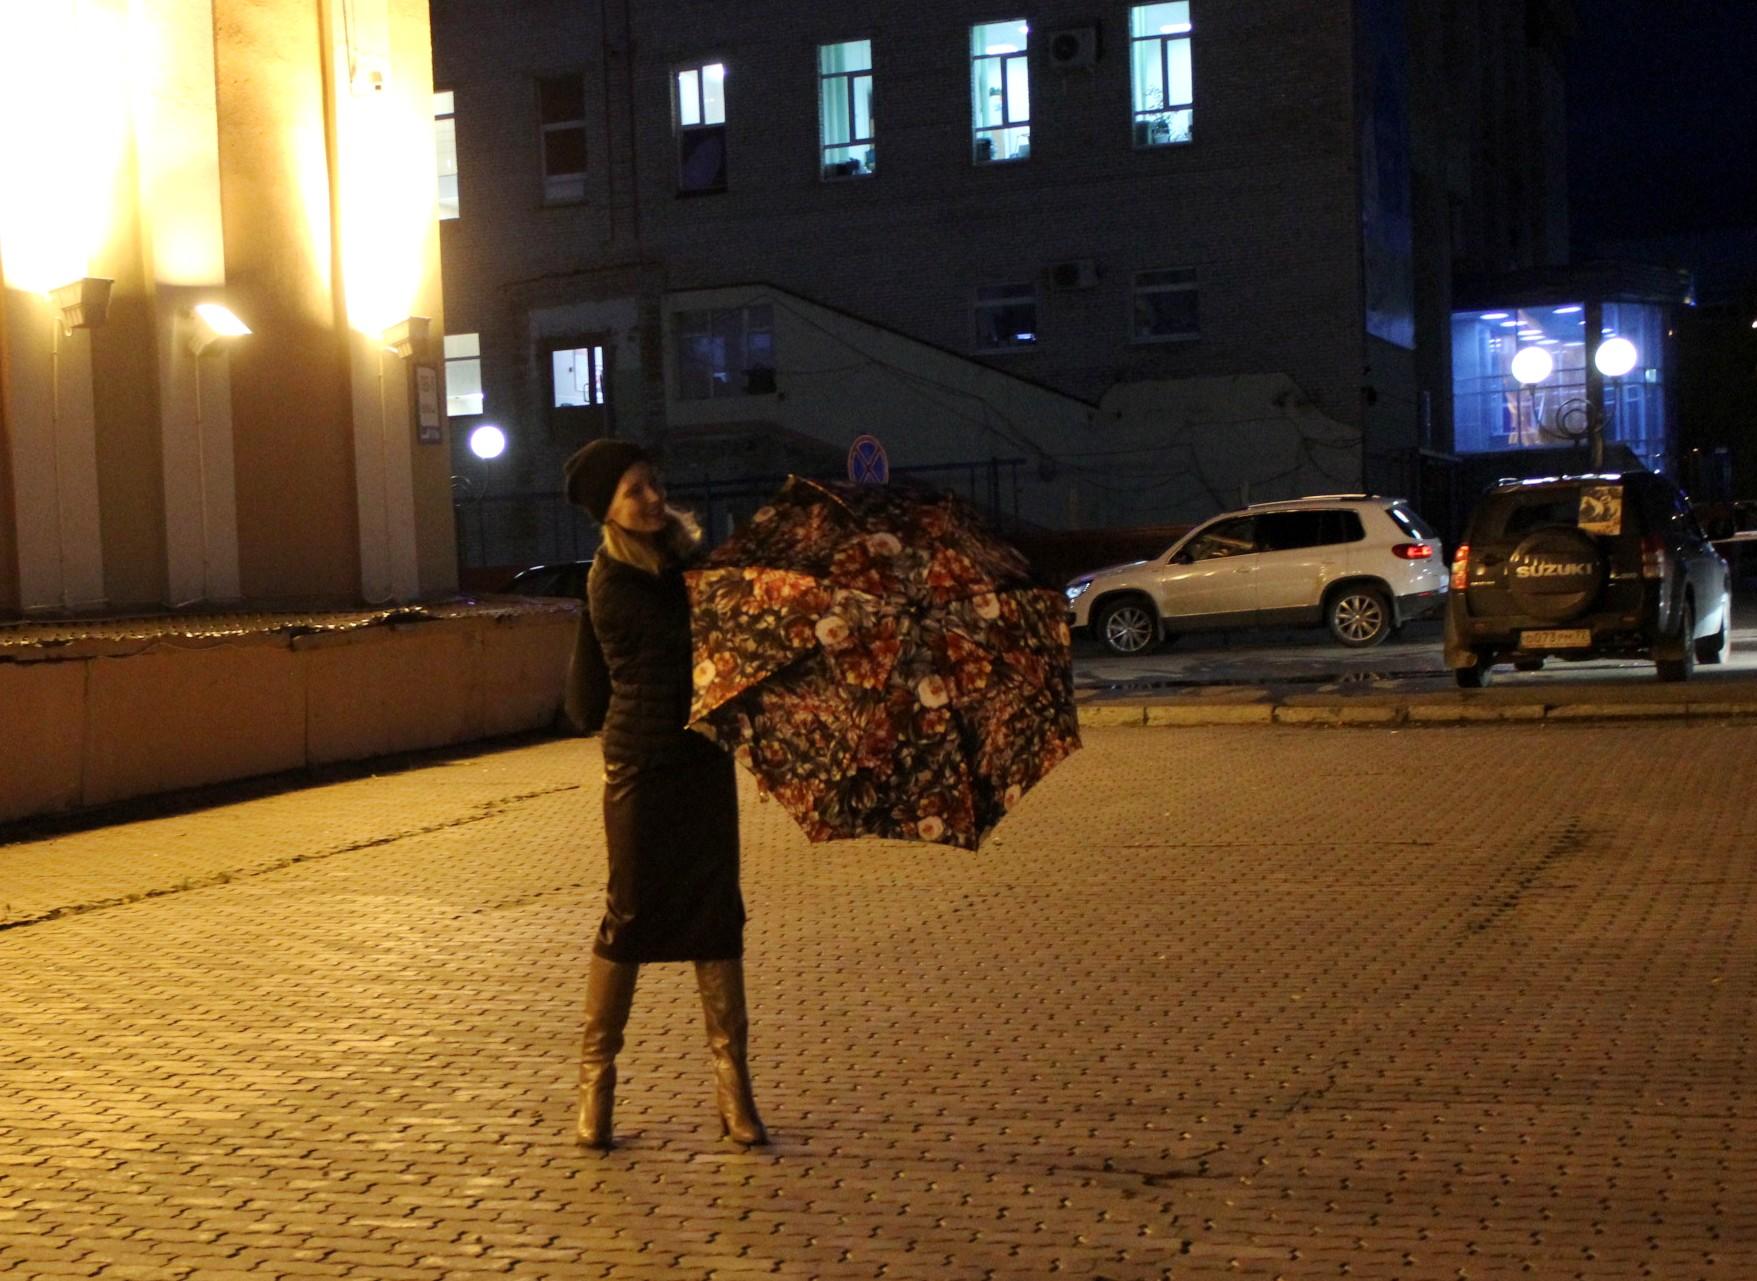 зонтик0.jpg